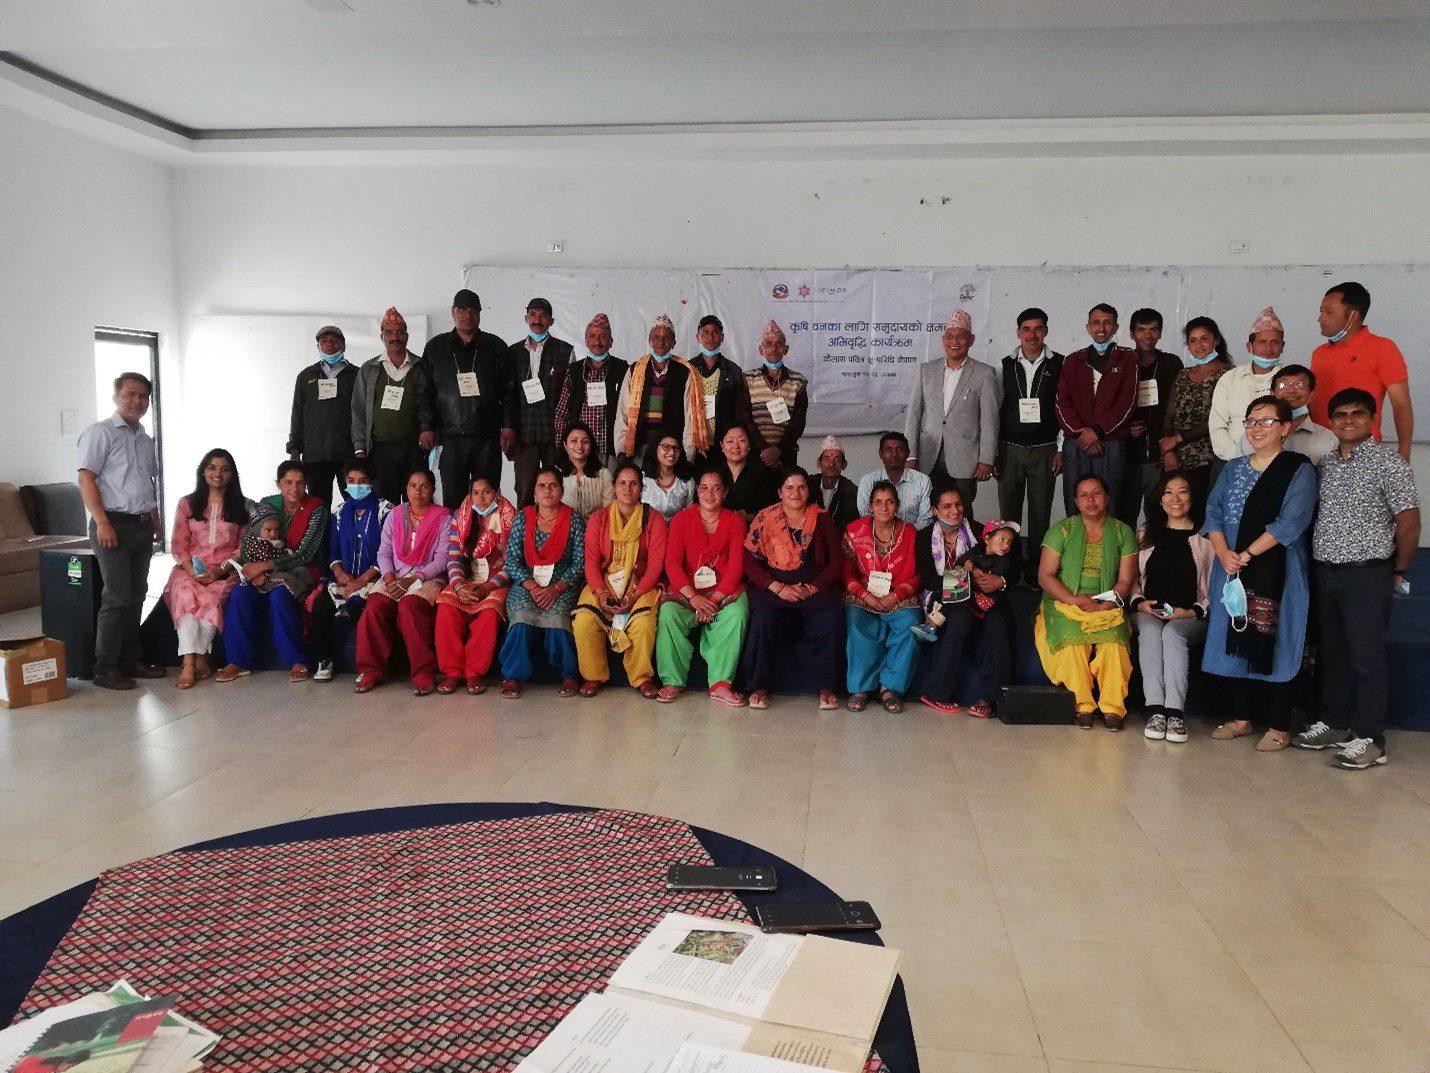 Taalkulla CFUG, Gwalekh Kedar Women's Cooperative, DNPL, and ICIMOD